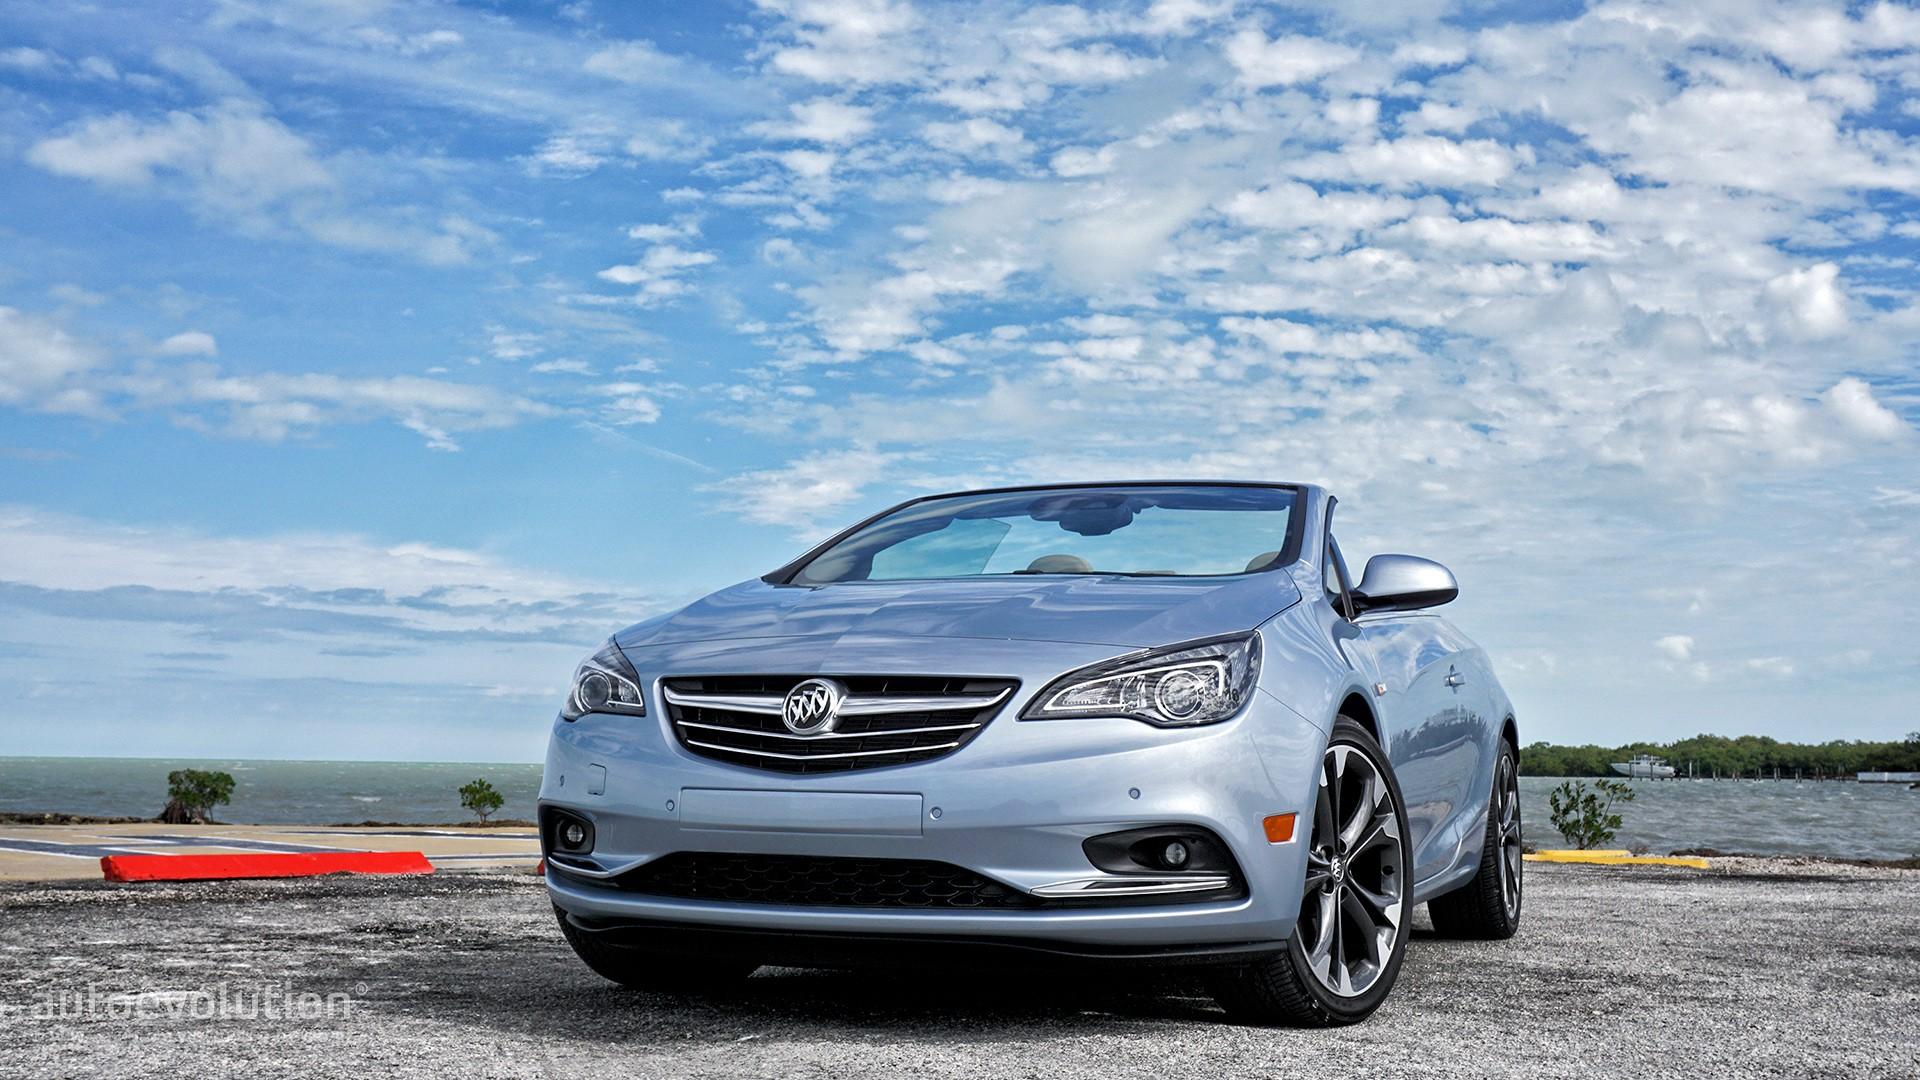 Ford Focus Rims >> Driven: 2016 Buick Cascada Convertible - autoevolution